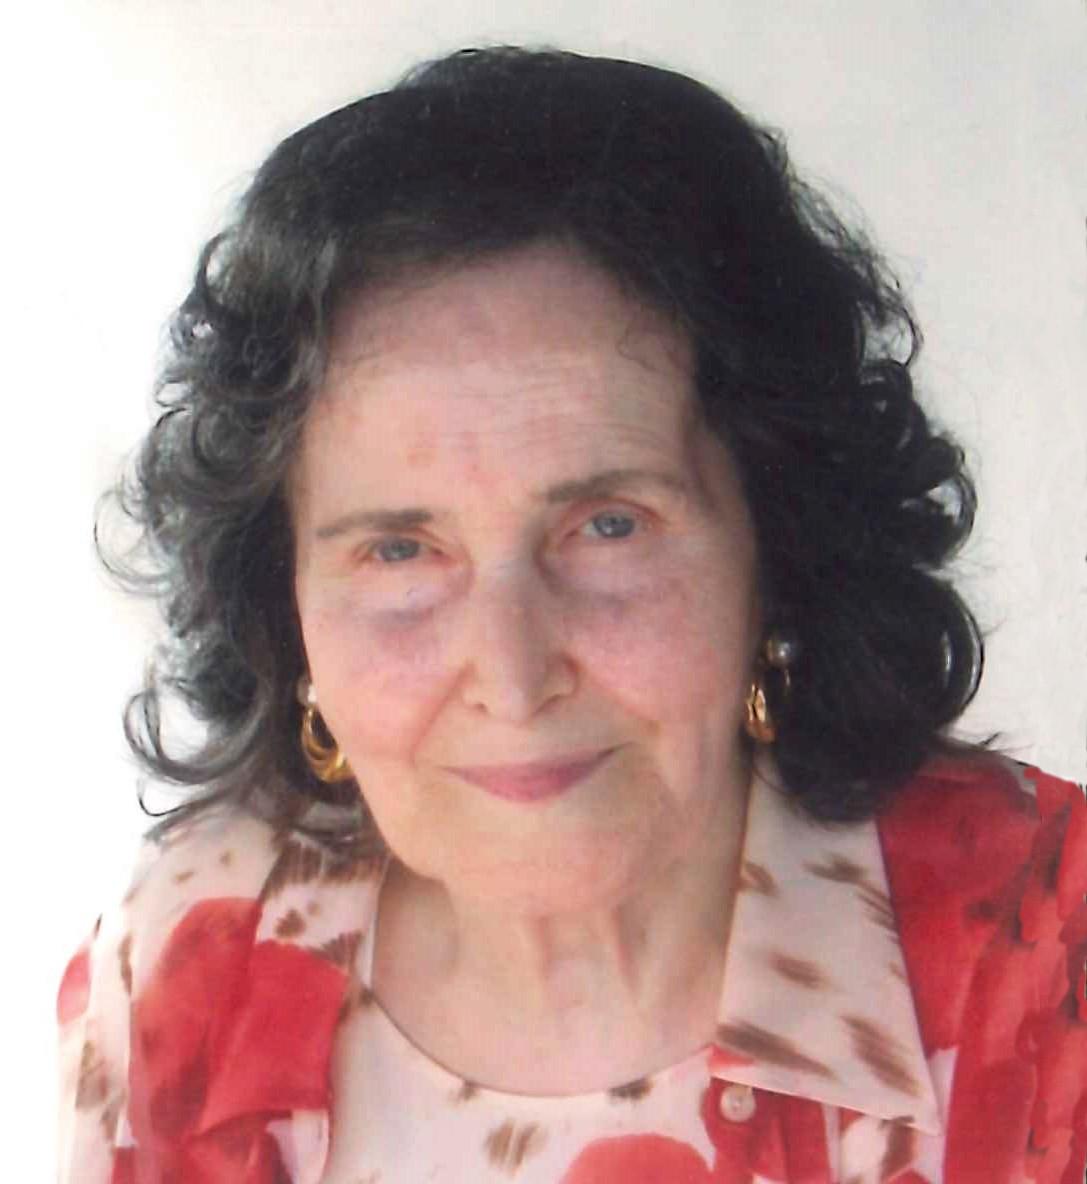 Maria Toneatto ved. Pagani